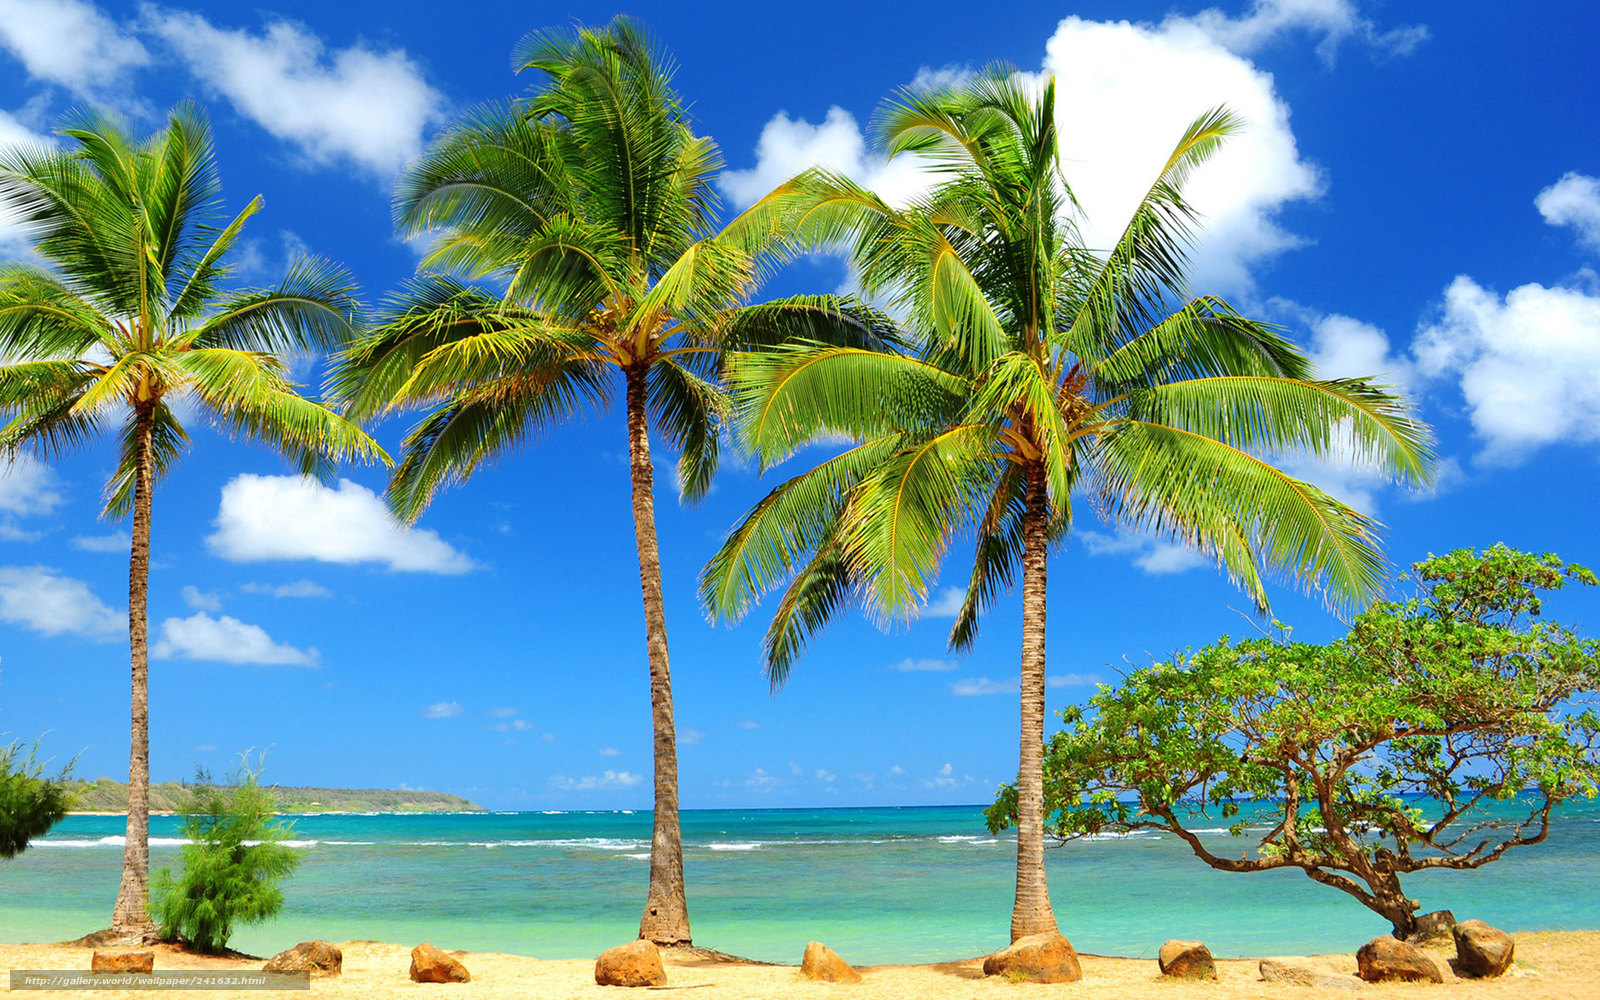 Скачать обои пальмы, море, океан ...: ru.gde-fon.com/download/palmy_more_okean_derevo_krivoe_kamni/241632...